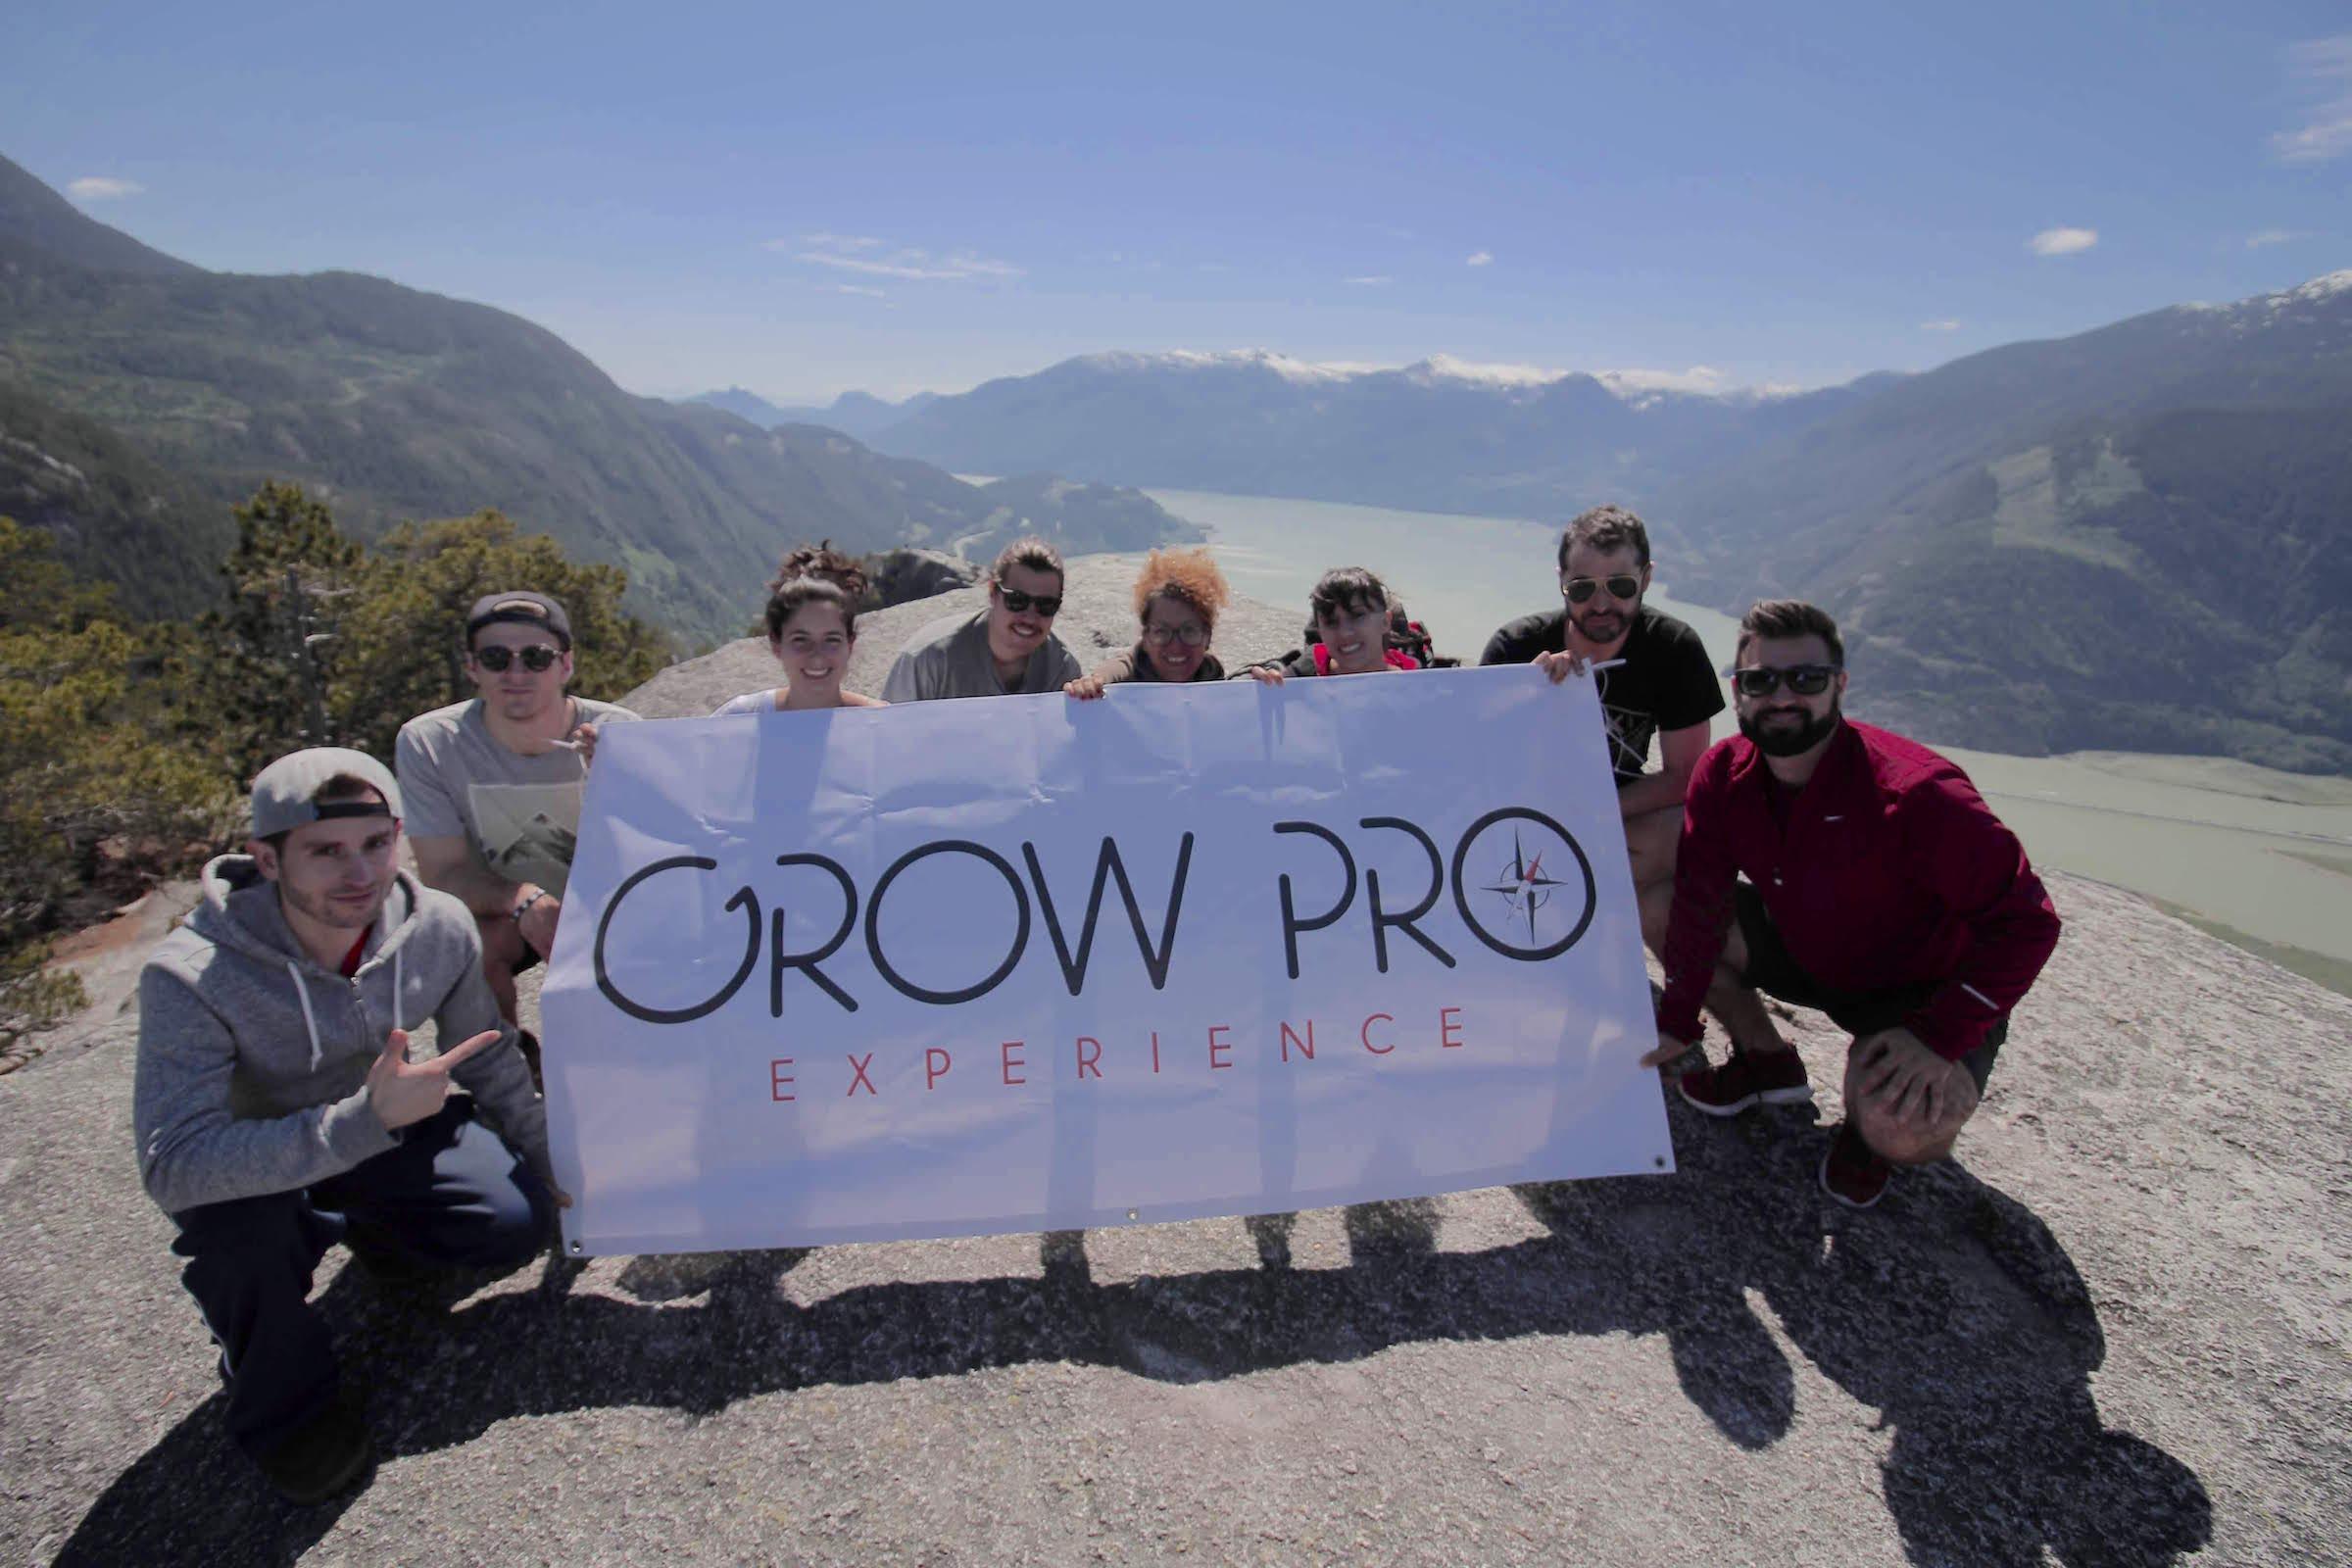 GrowPro en Stawamus Chief (Canadá). Aunque todo empezó en Australia...